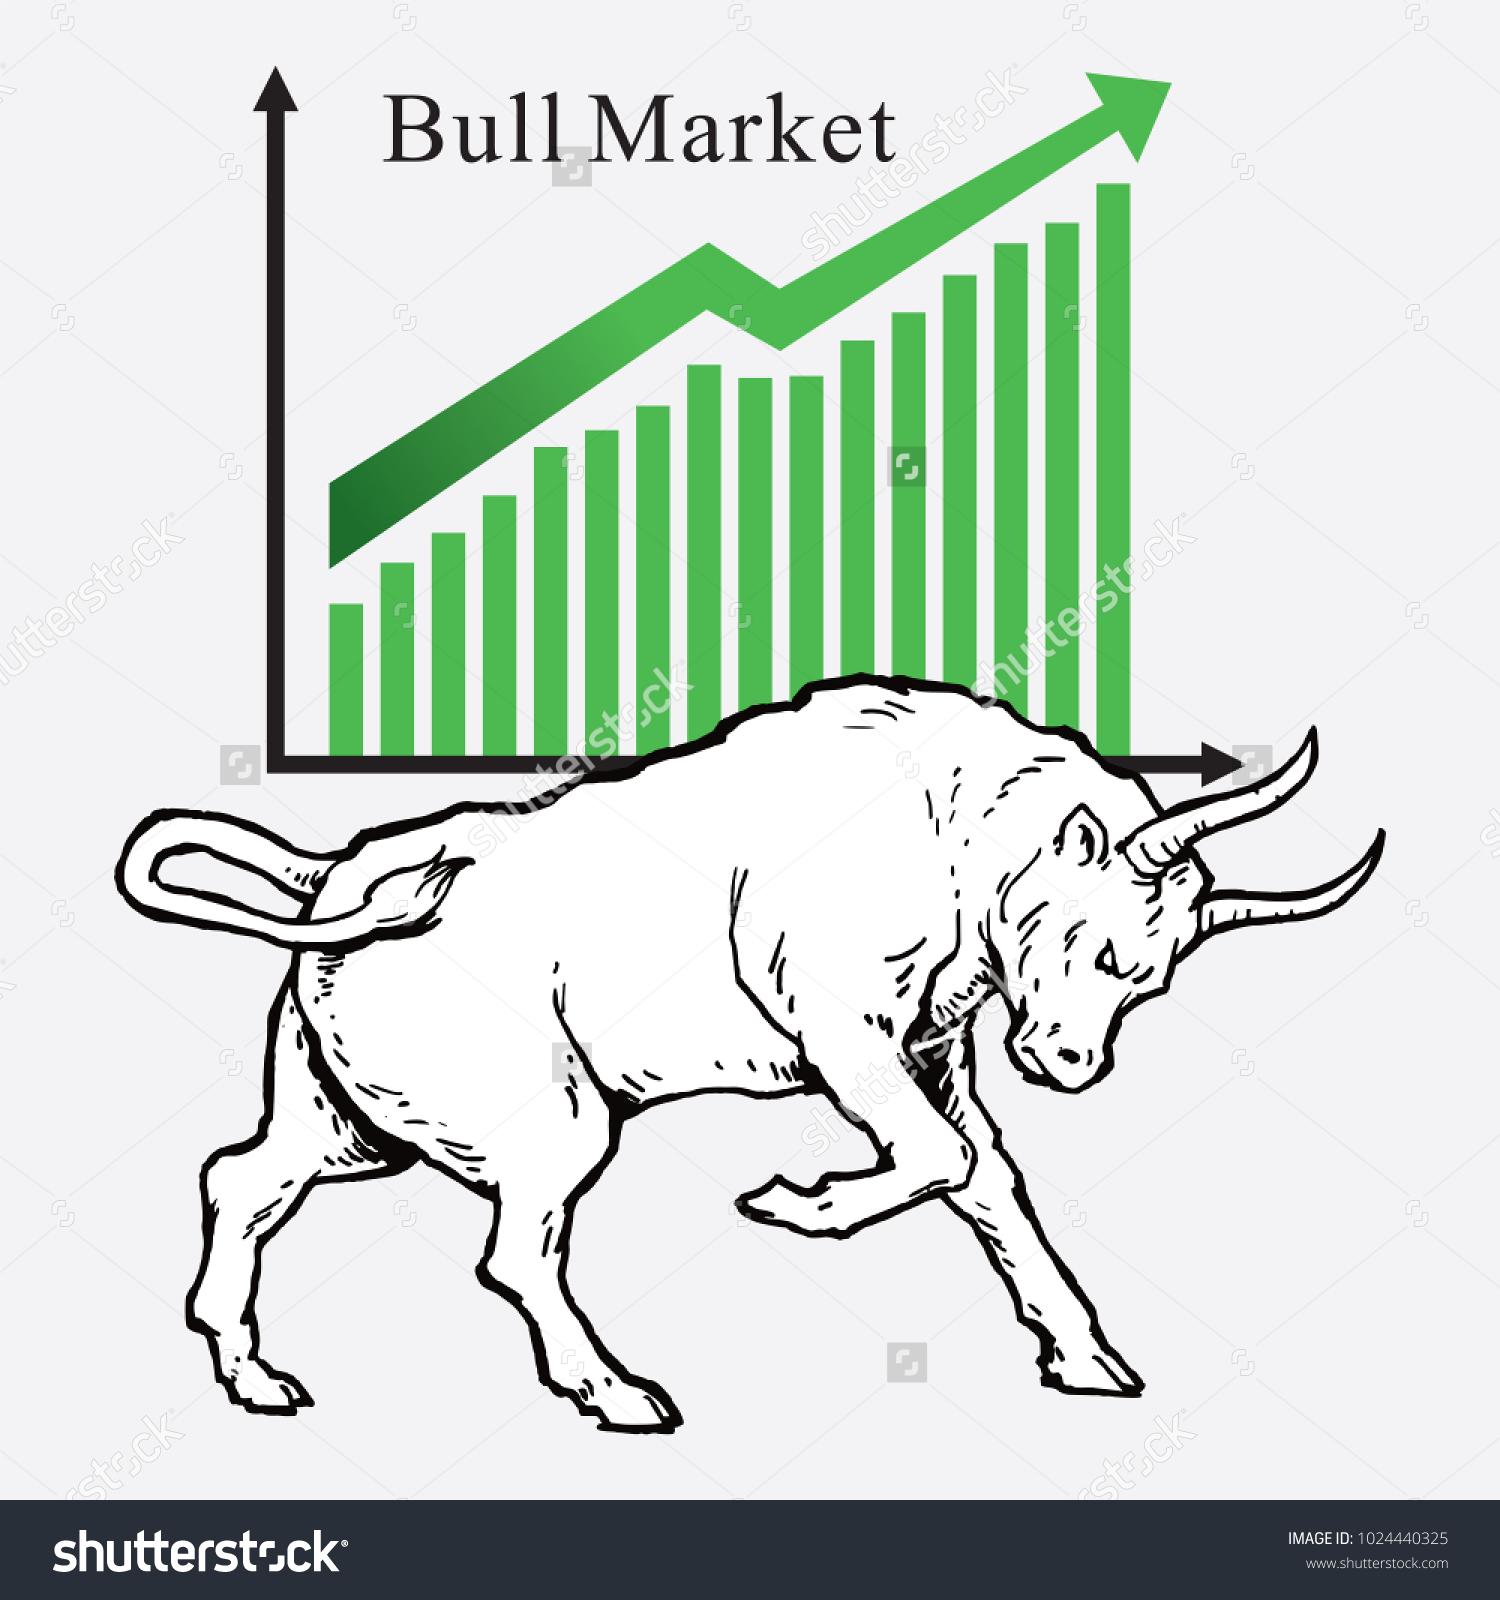 Bull Market Symbols Stock Market Trends Stock Vector Royalty Free